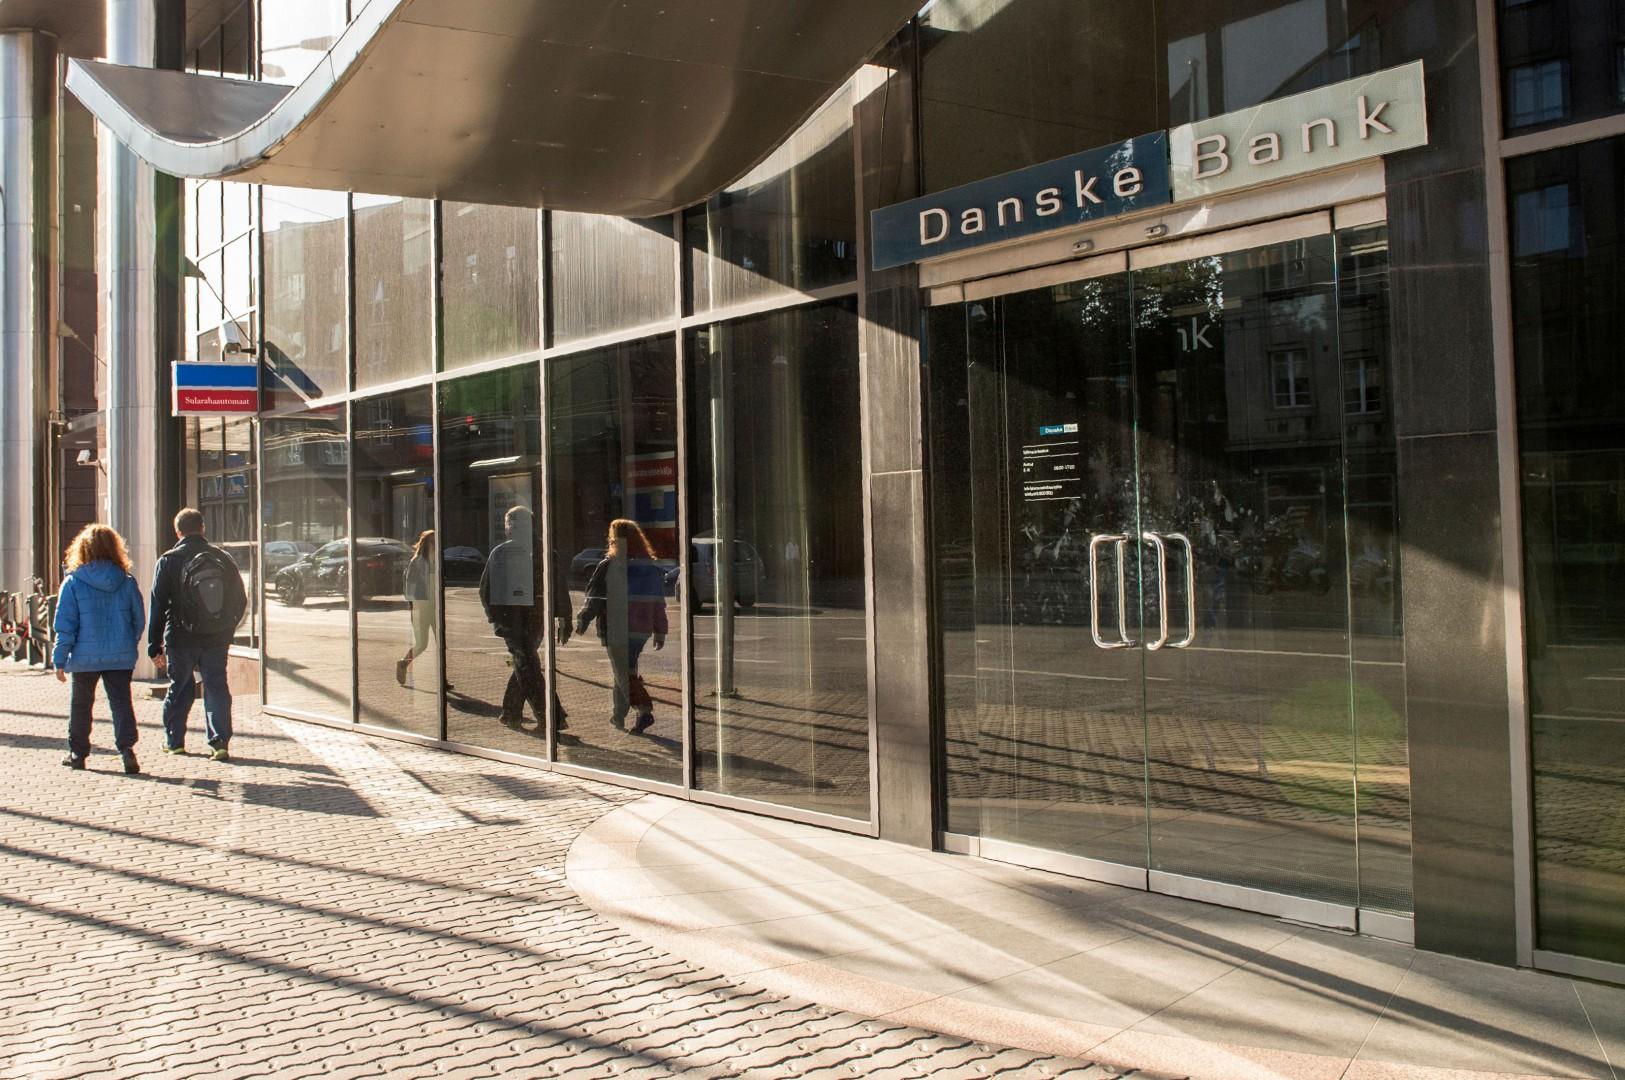 (FILES) This file photo taken on September 5, 2017 shows people walking past a branch of Denmark's Danske Bank in Tallinn, Estonia. - The general director of the Danske Bank resigned on September 19, 2018 following a money laundering scandal in Estonia. (Photo by RAIGO PAJULA / AFP)